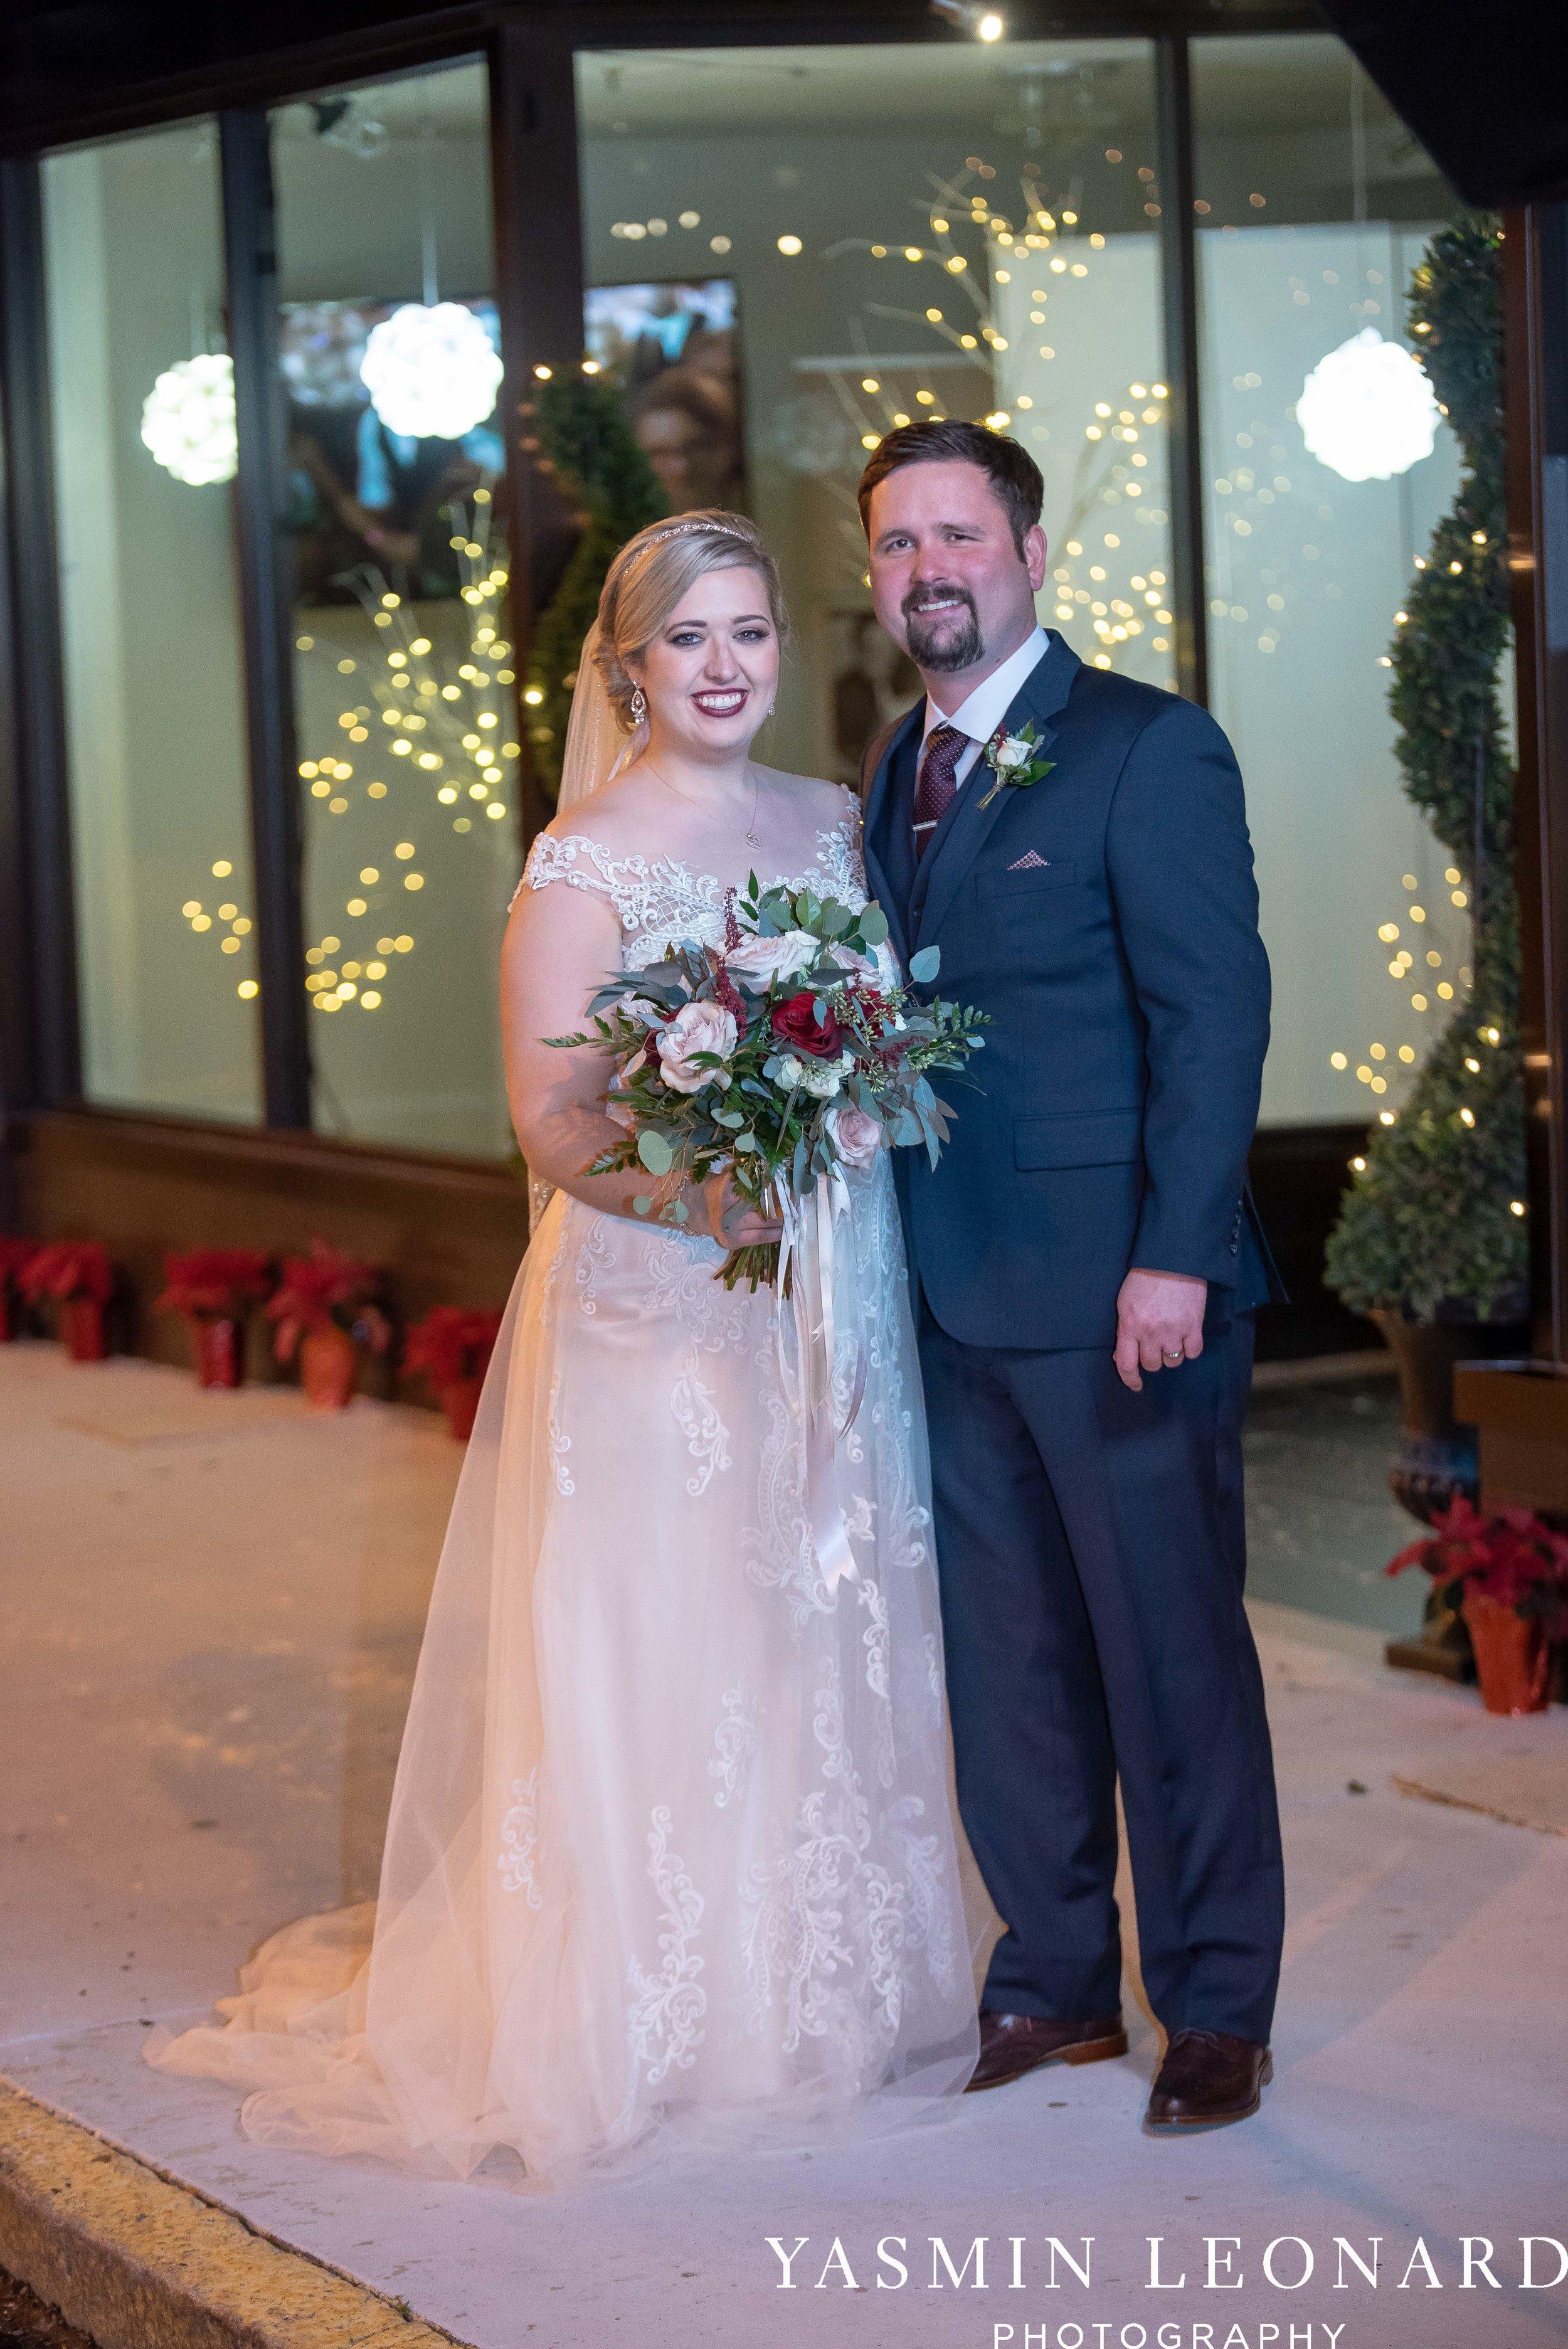 Rebekah and Matt - 105 Worth Event Centre - Yasmin Leonard Photography - Asheboro Wedding - NC Wedding - High Point Weddings - Triad Weddings - Winter Wedding-42.jpg